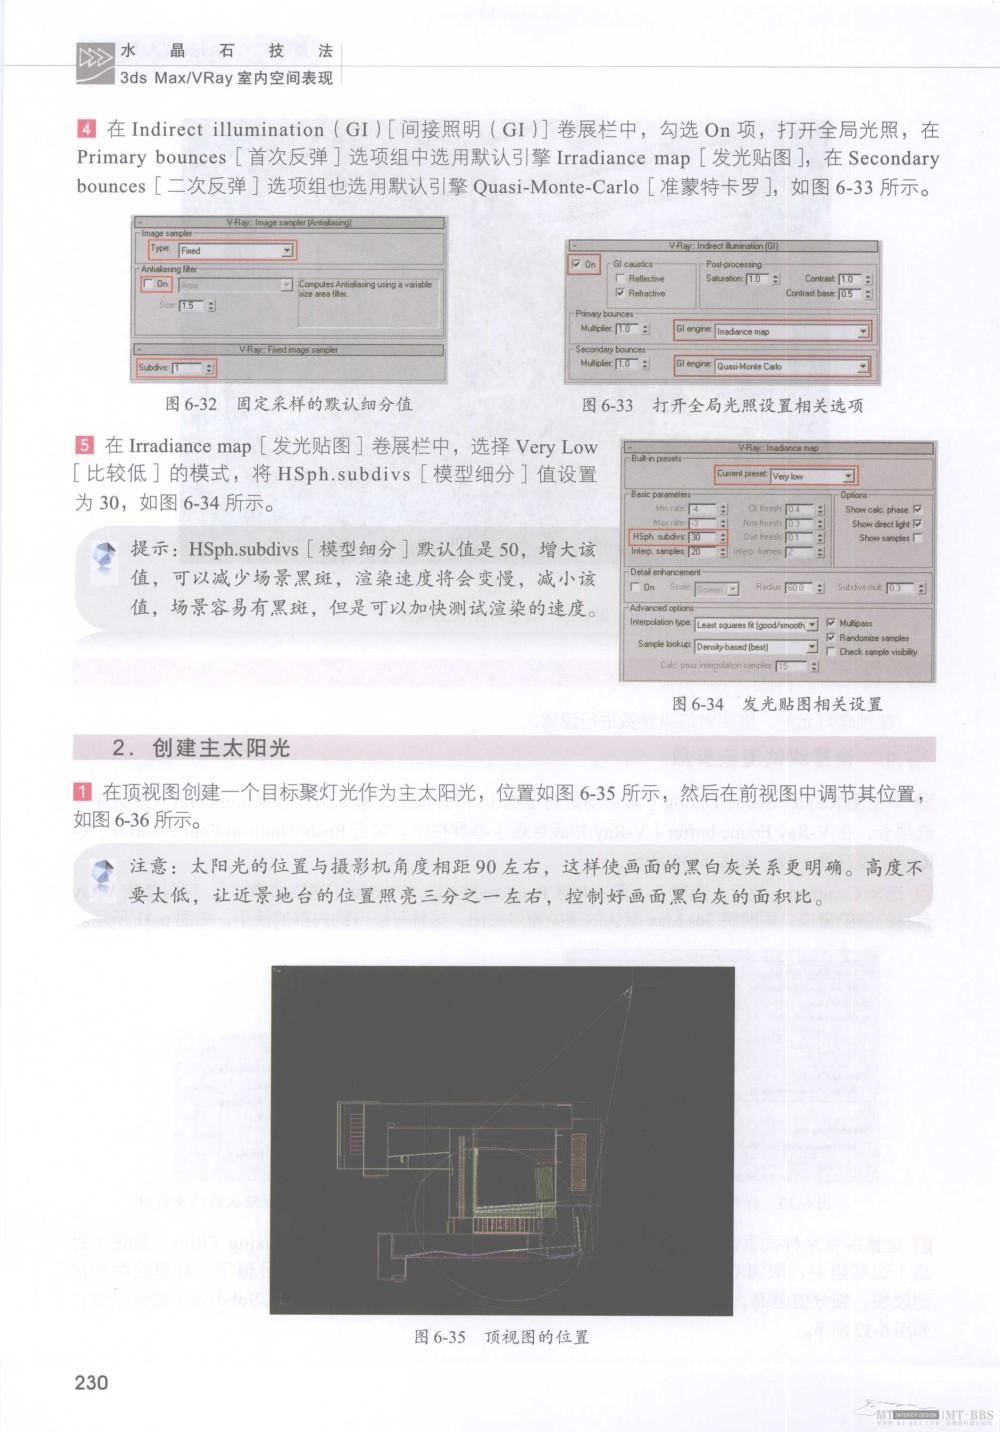 水晶石技法-3ds_Max&VRay室内空间表现_水晶石技法-3ds_Max&VRay室内空间表现_页面_236.jpg